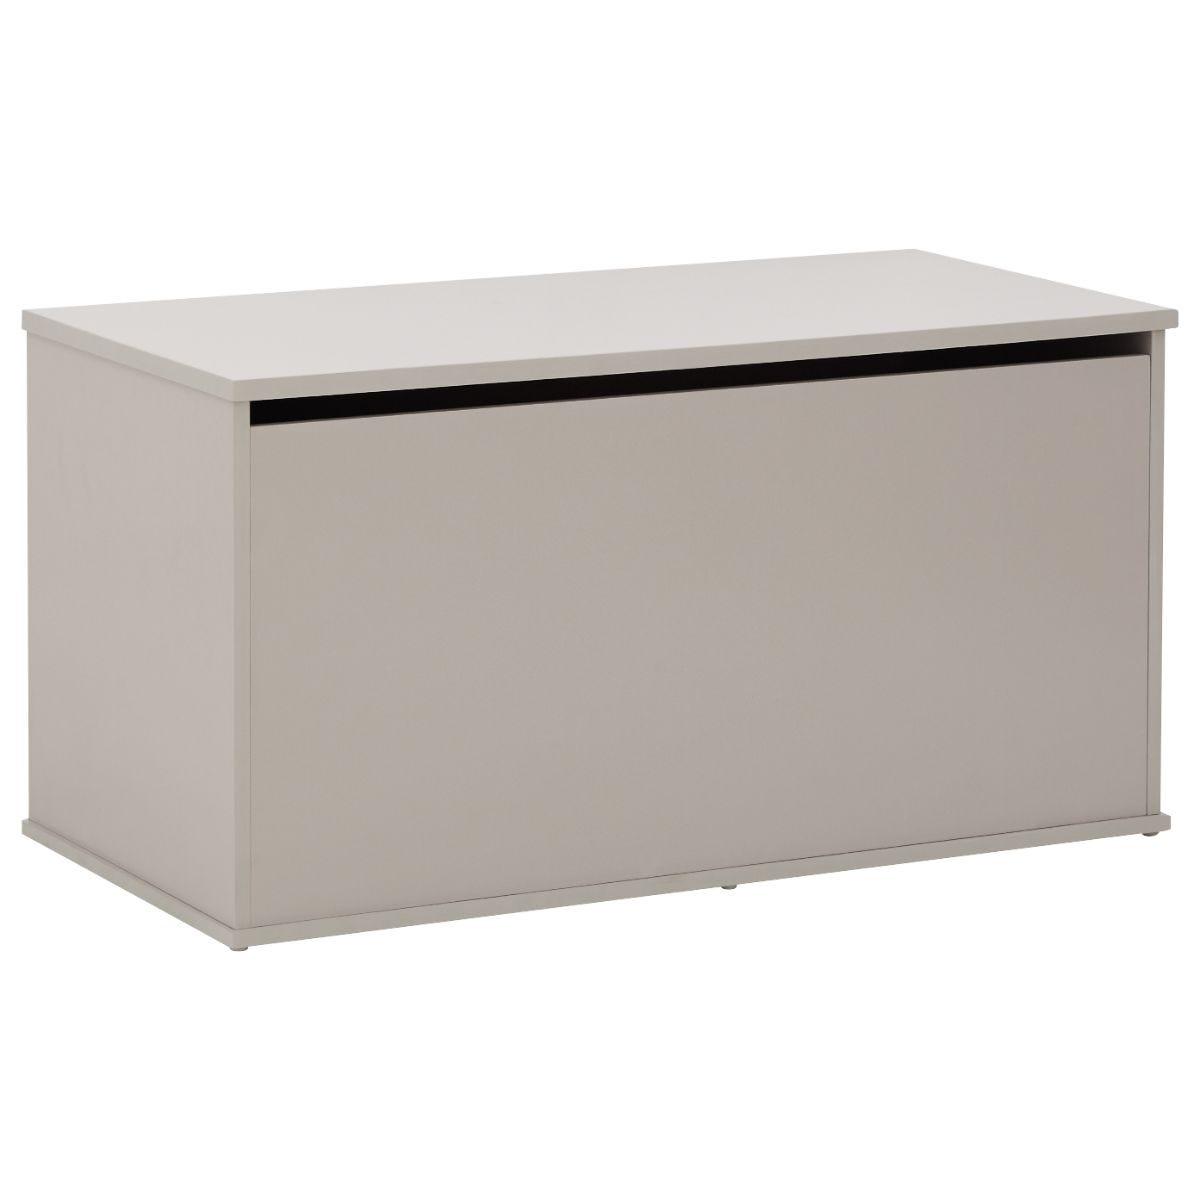 Panama Ottoman Storage Box Grey